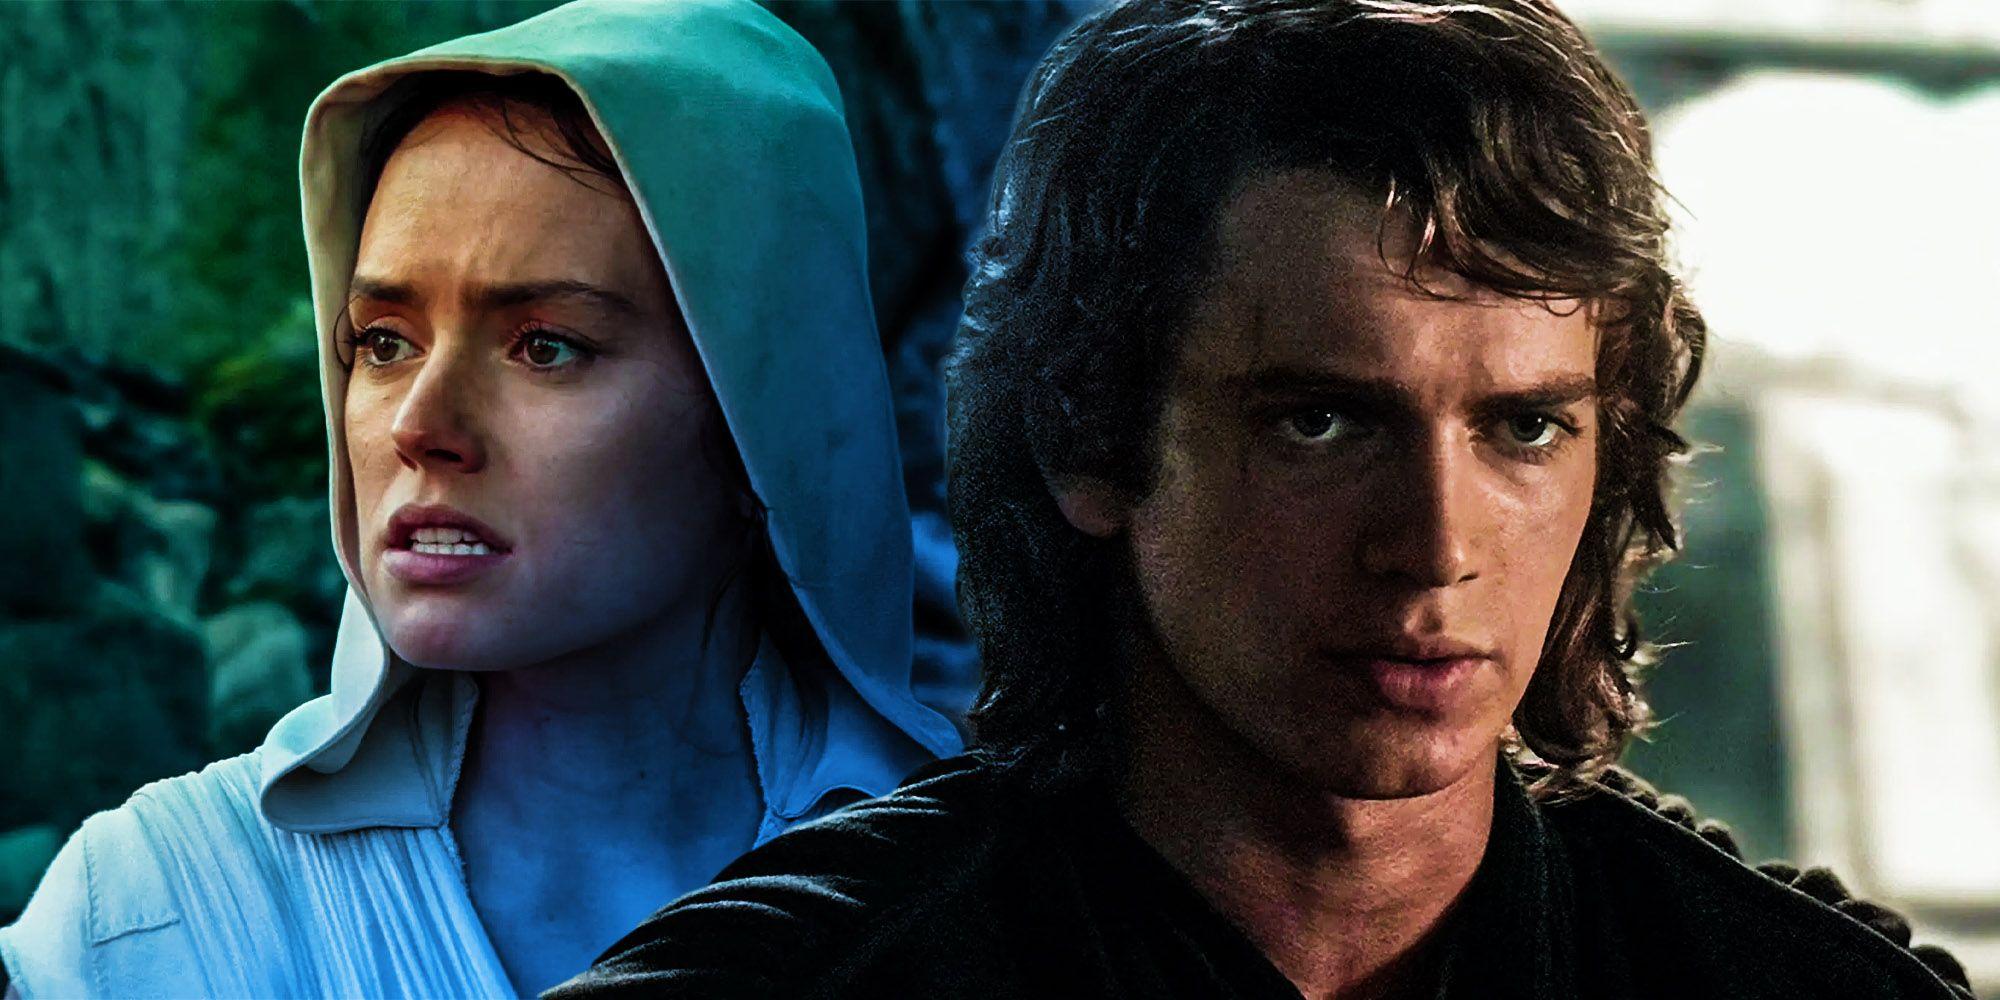 Star Wars: Rey is More Like Anakin Than Rise of Skywalker Revealed